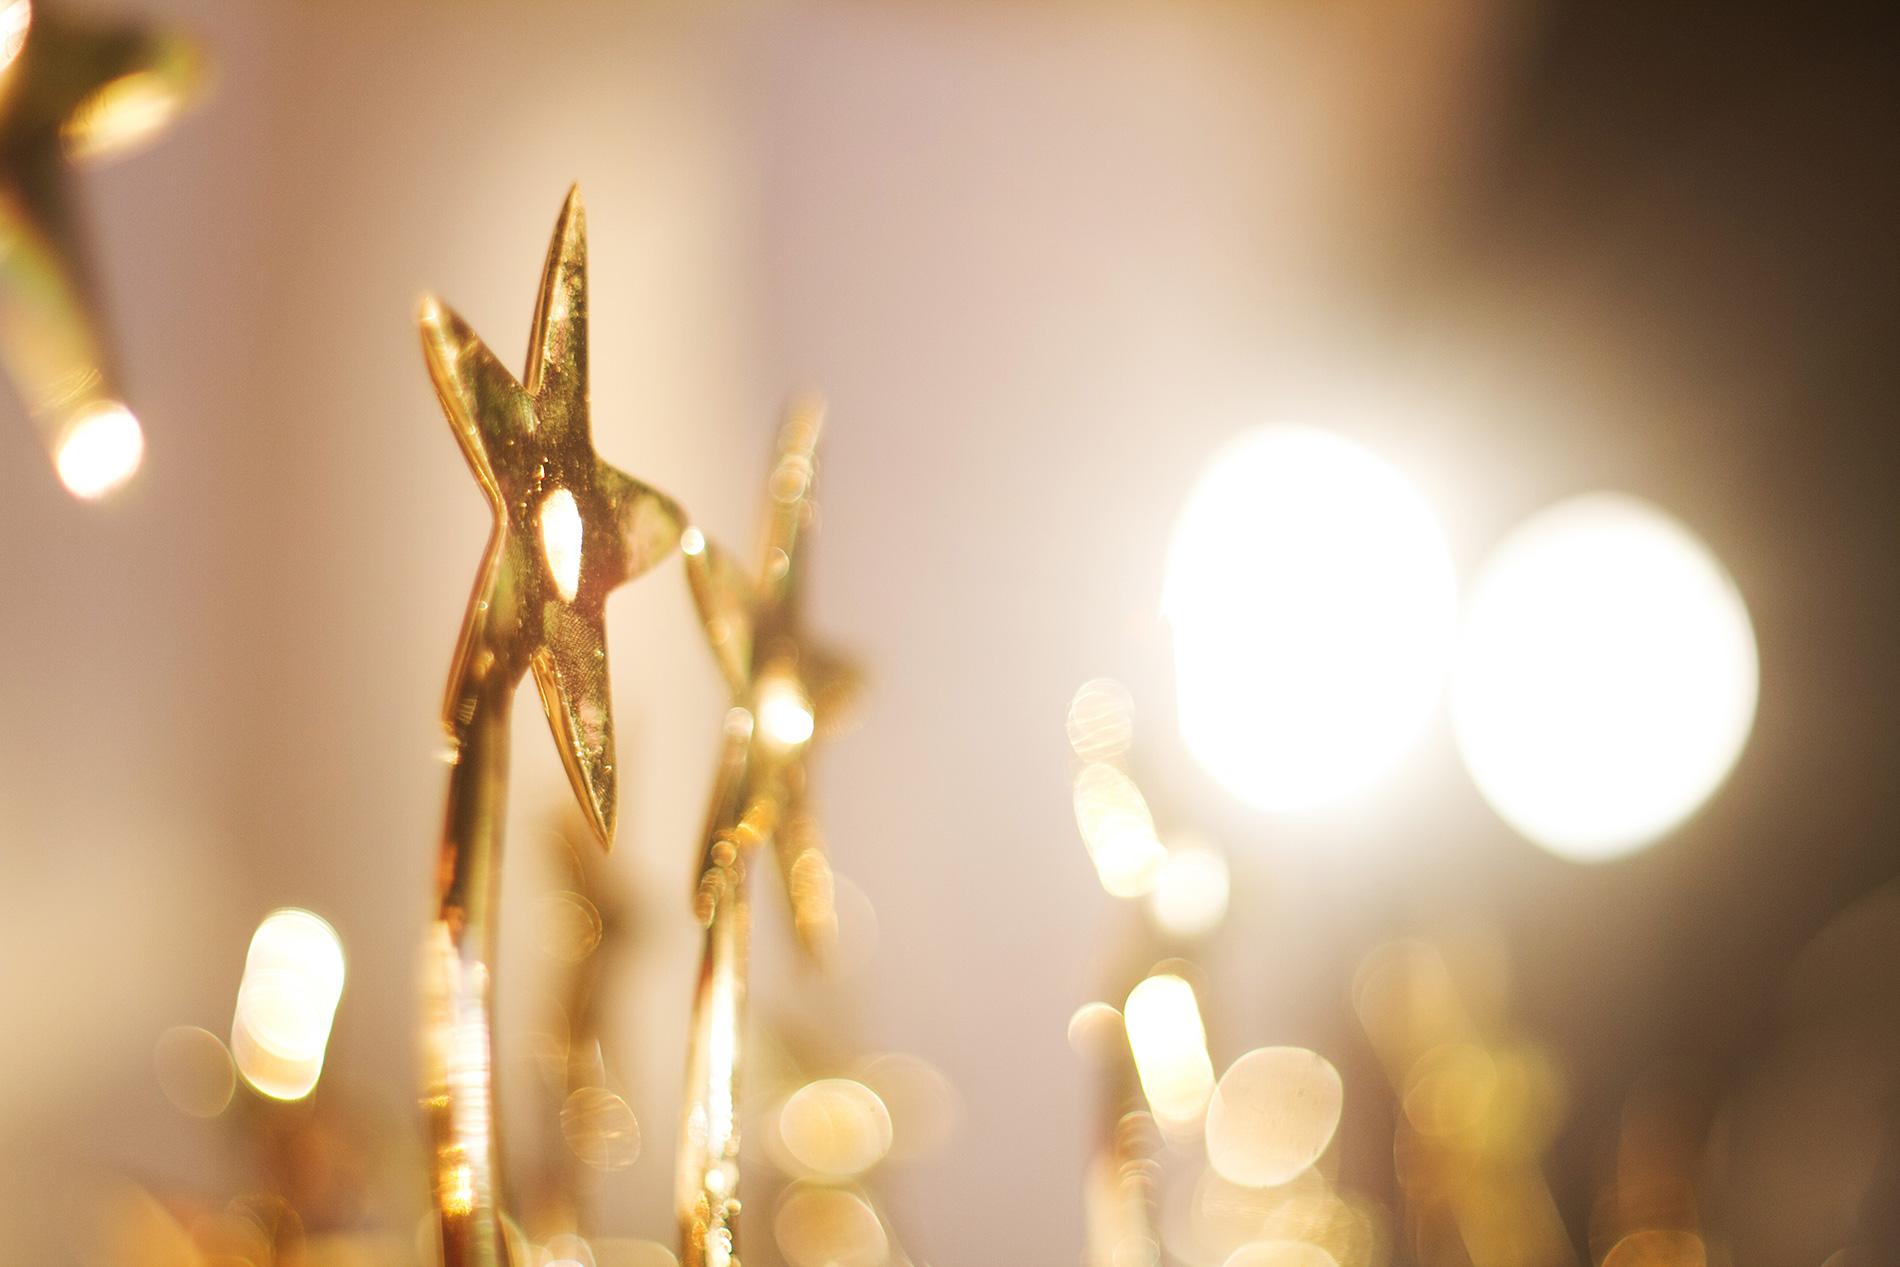 LSMx wins Gold Stevie Award